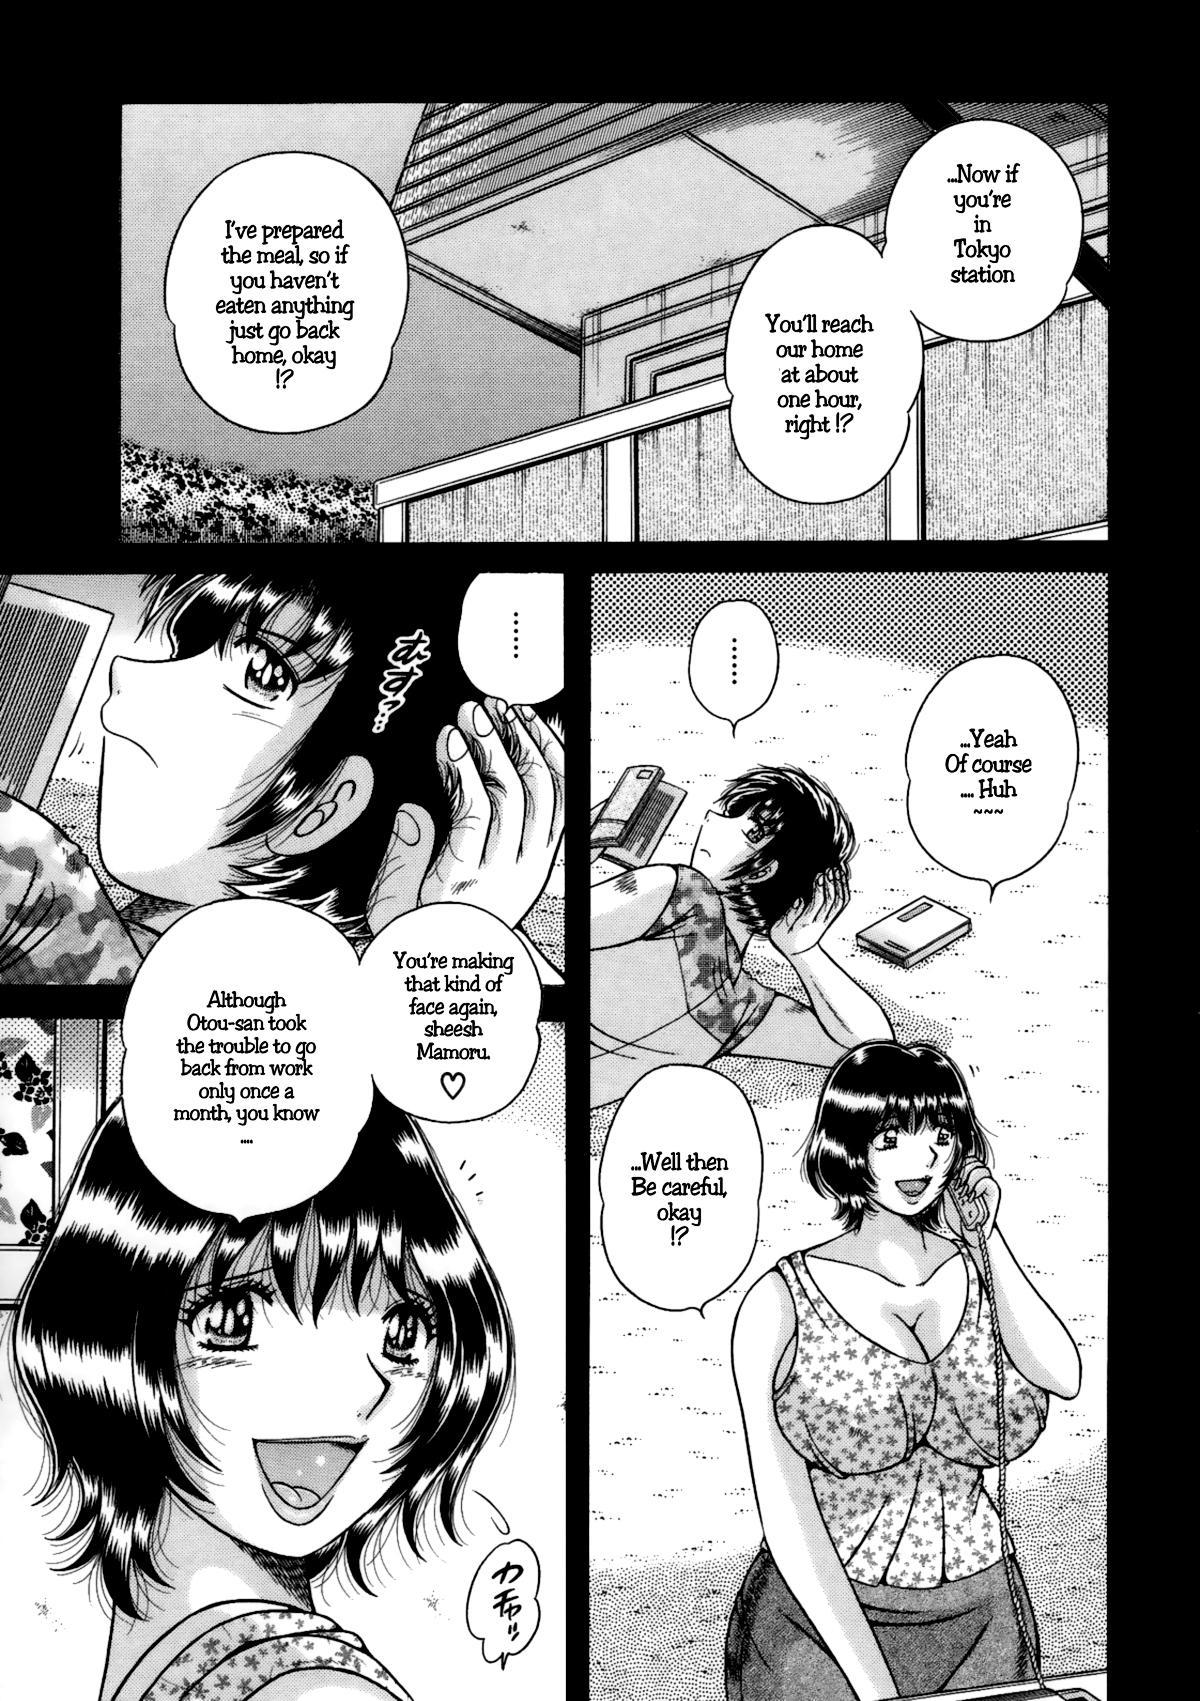 Jukubo Yuugi - Itoshii Hito Chapter 1 + 2 + 3 22